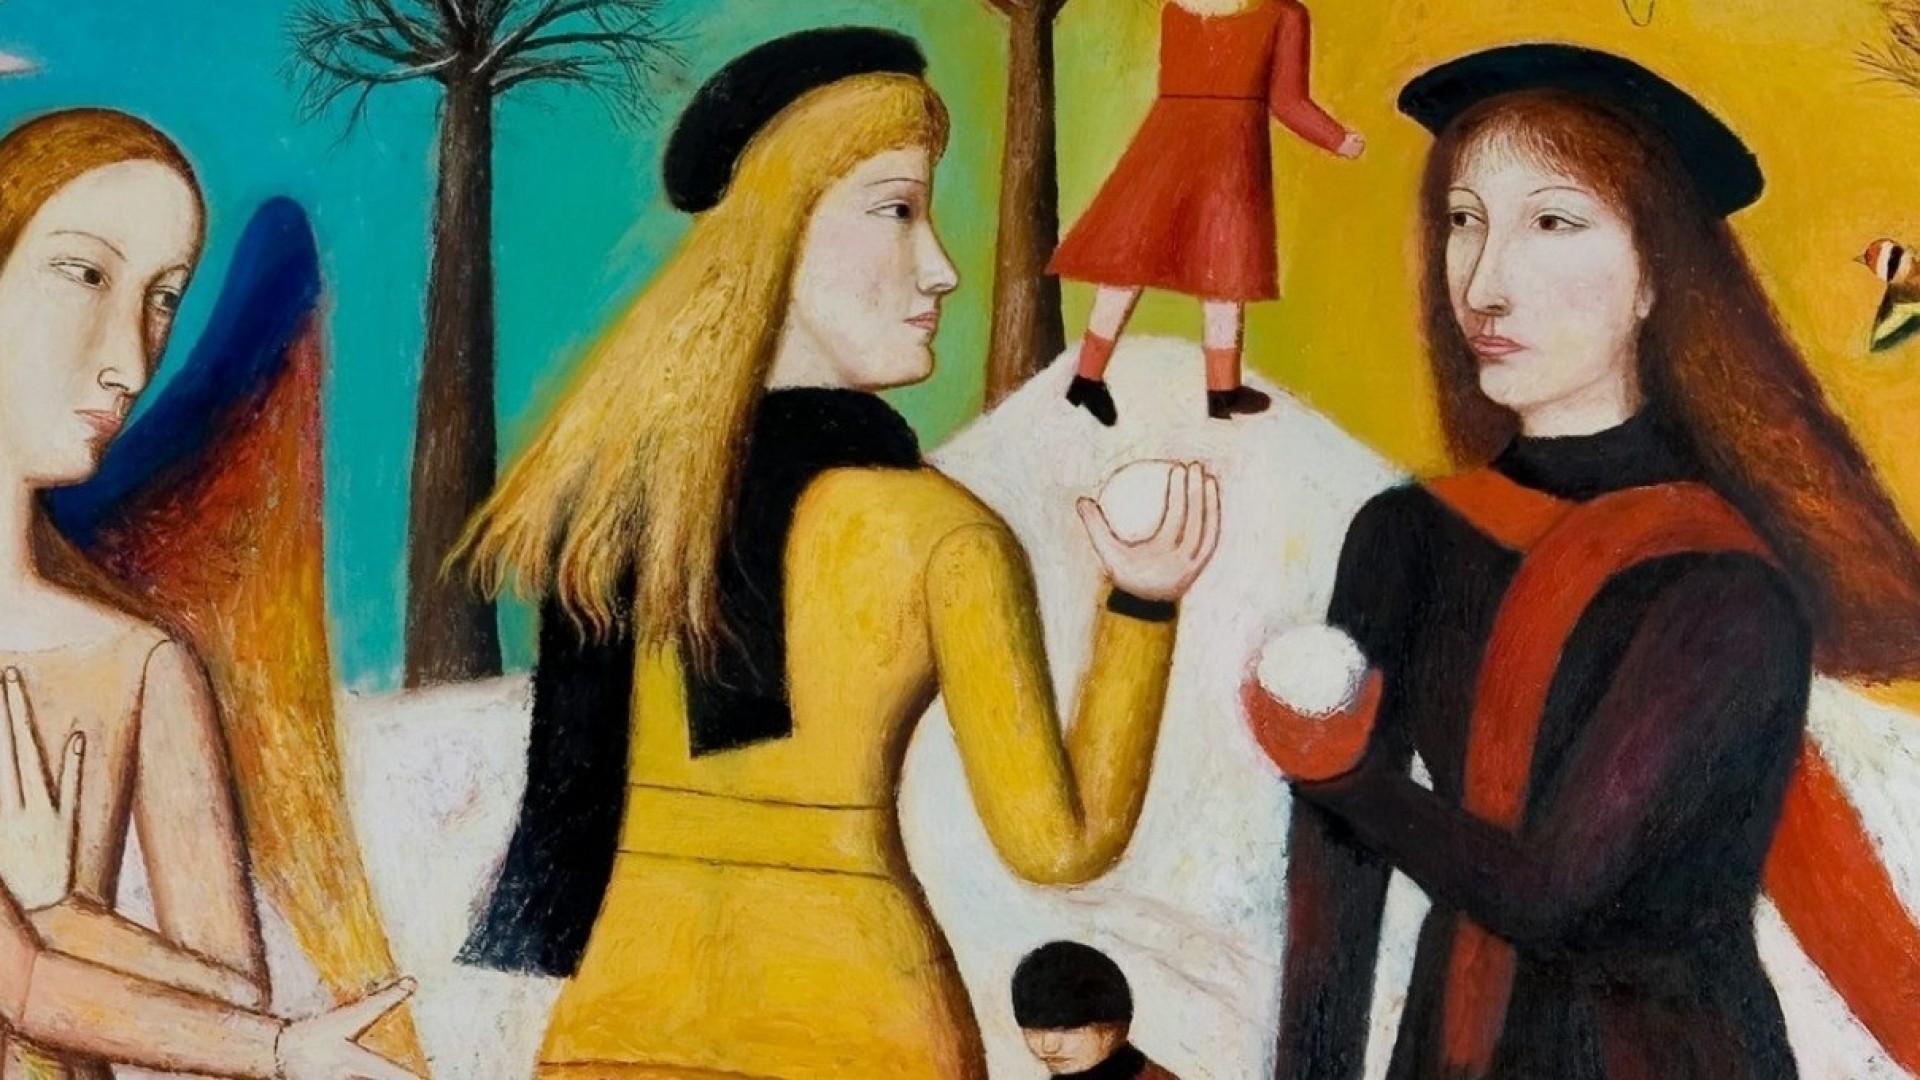 Александр Шуриц: «Живопись сейчас не выставляют… Говорят – не формат»